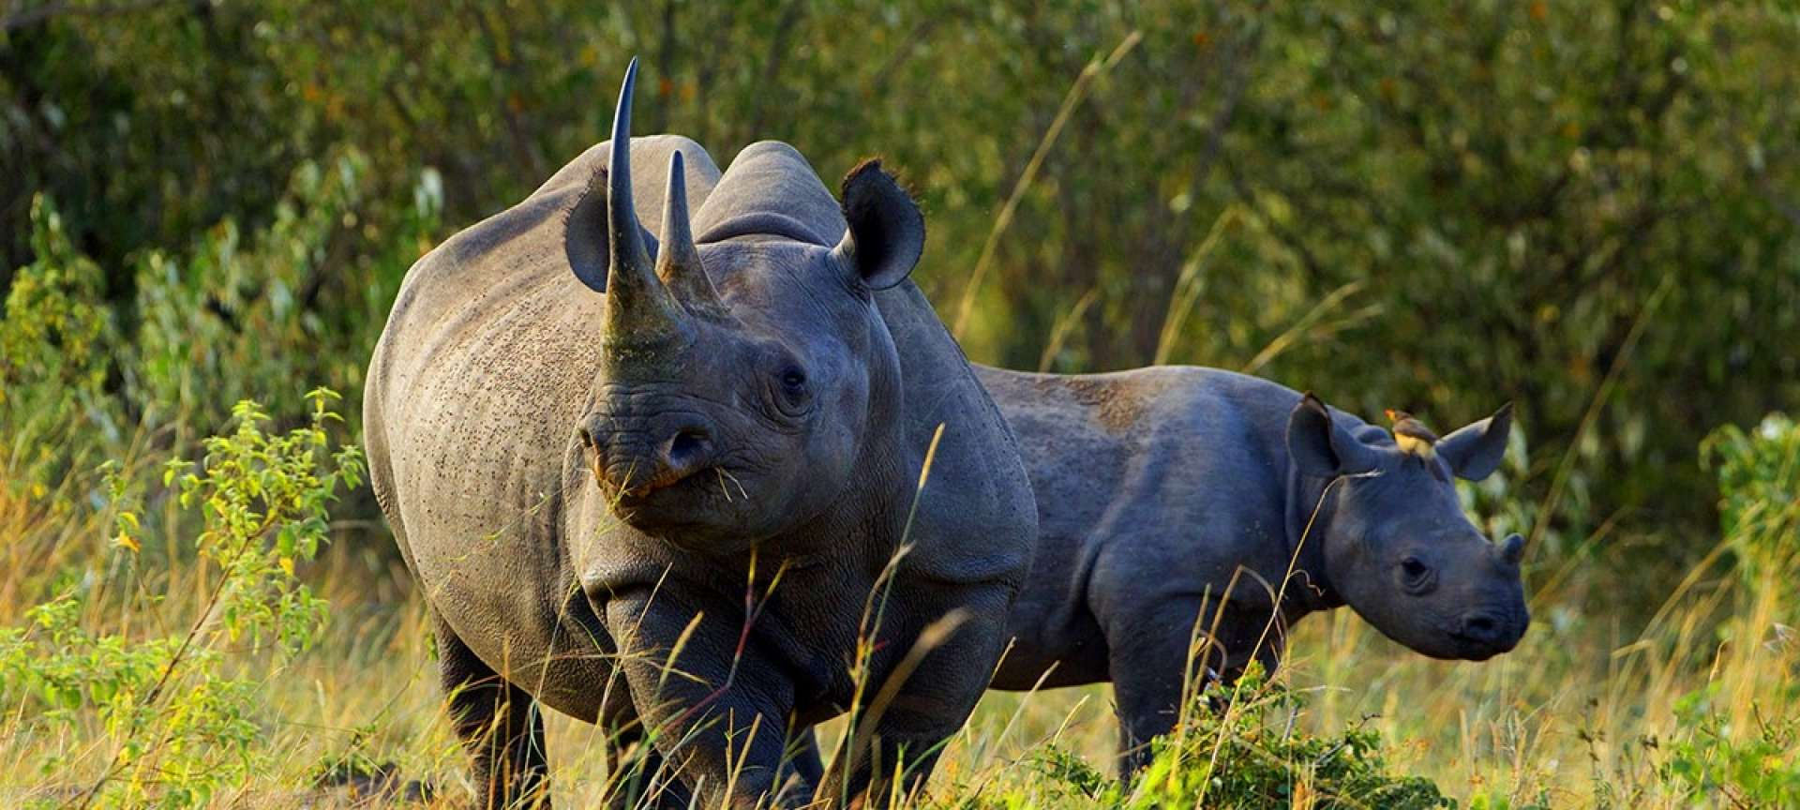 Rhino_Aberdare national park_kenya